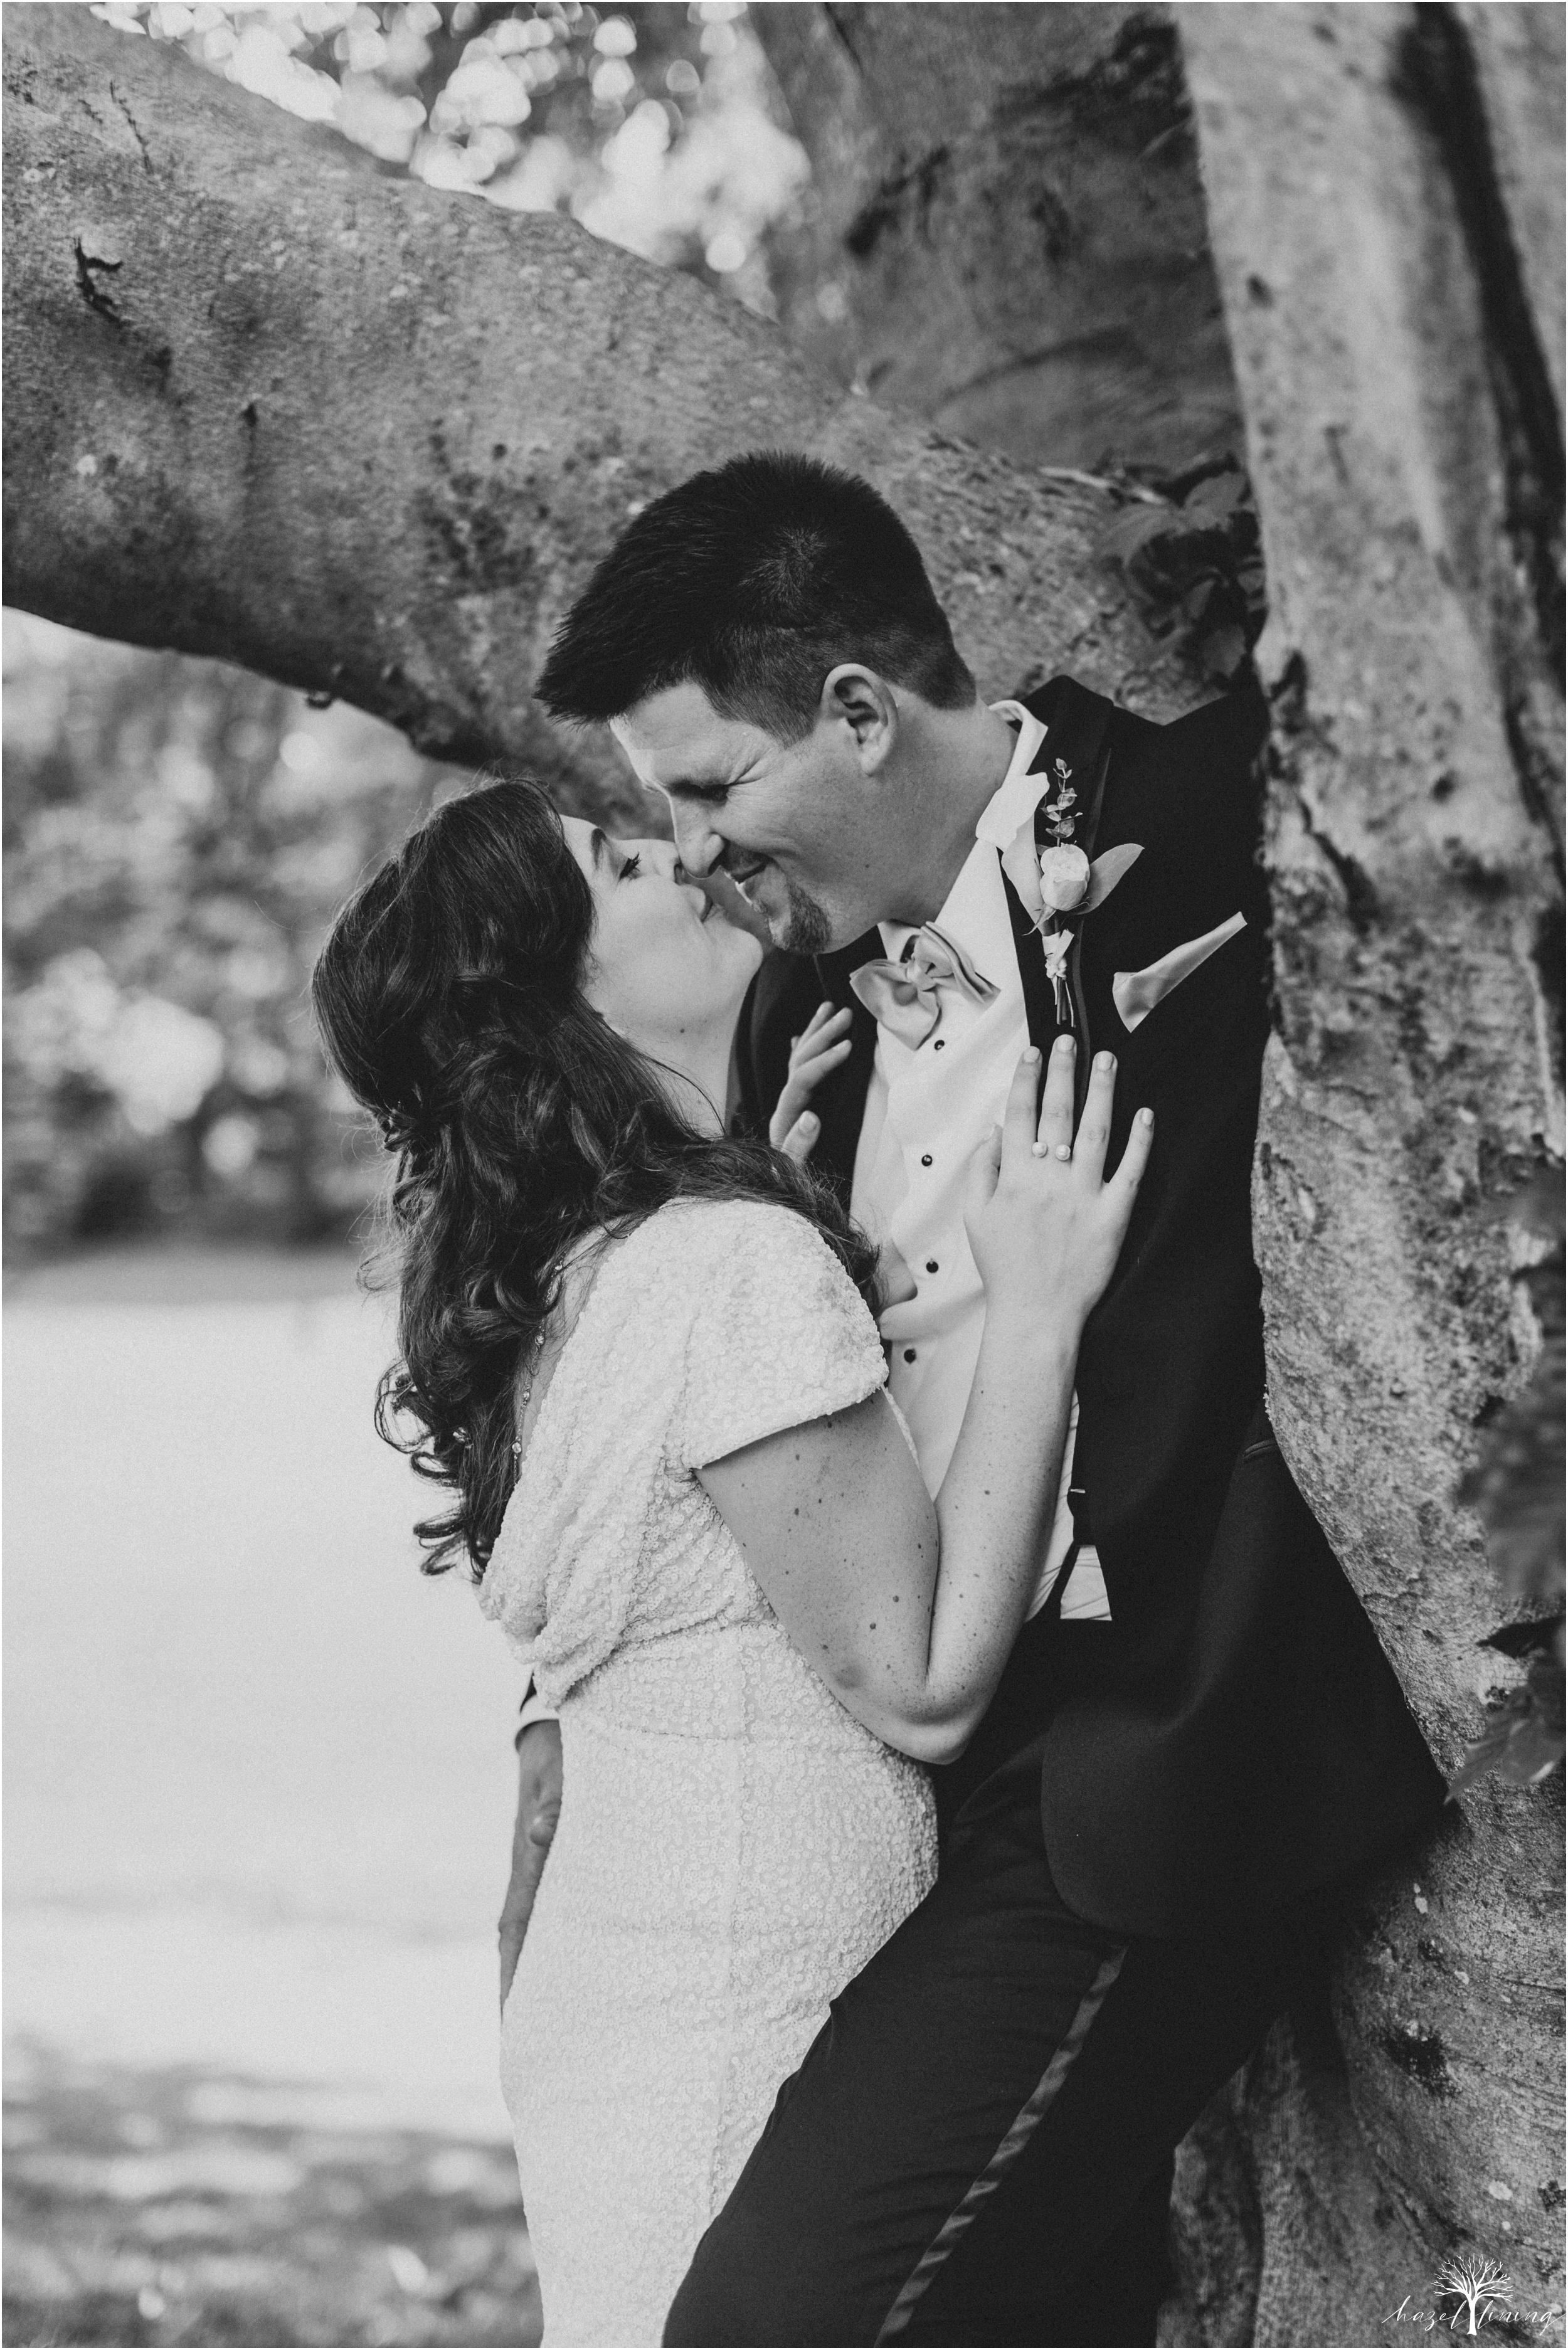 elizabeth-doelp-andrew-foreback-middletown-country-club-summer-langhorne-pennsylvania-wedding-hazel-lining-travel-wedding-elopement-photography_0099.jpg